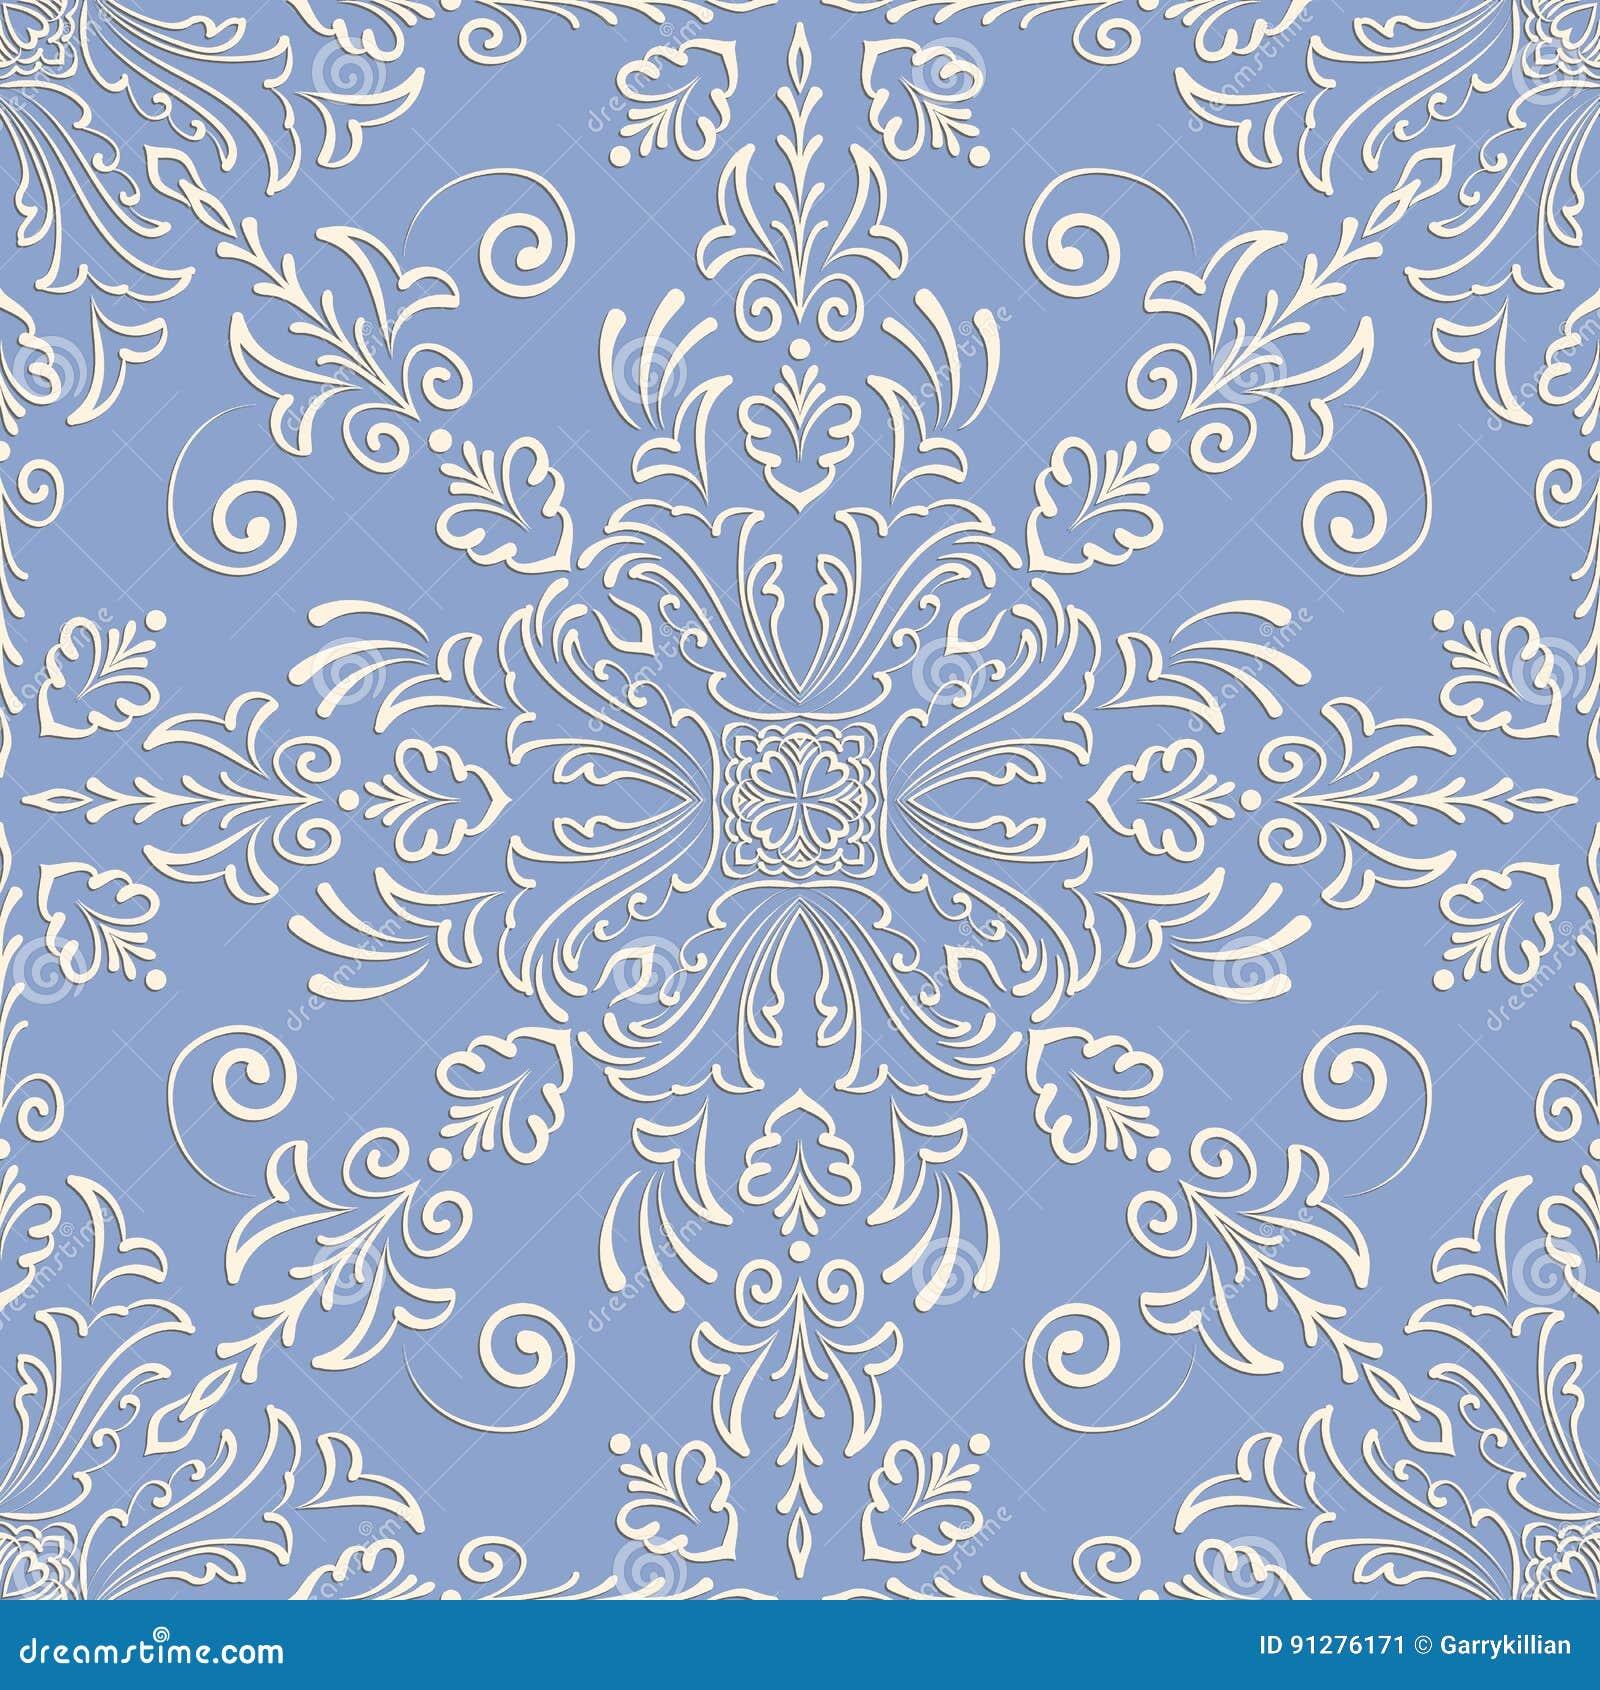 Zentangle称呼了几何装饰品样式元素 东方传统装饰品 Boho称呼了